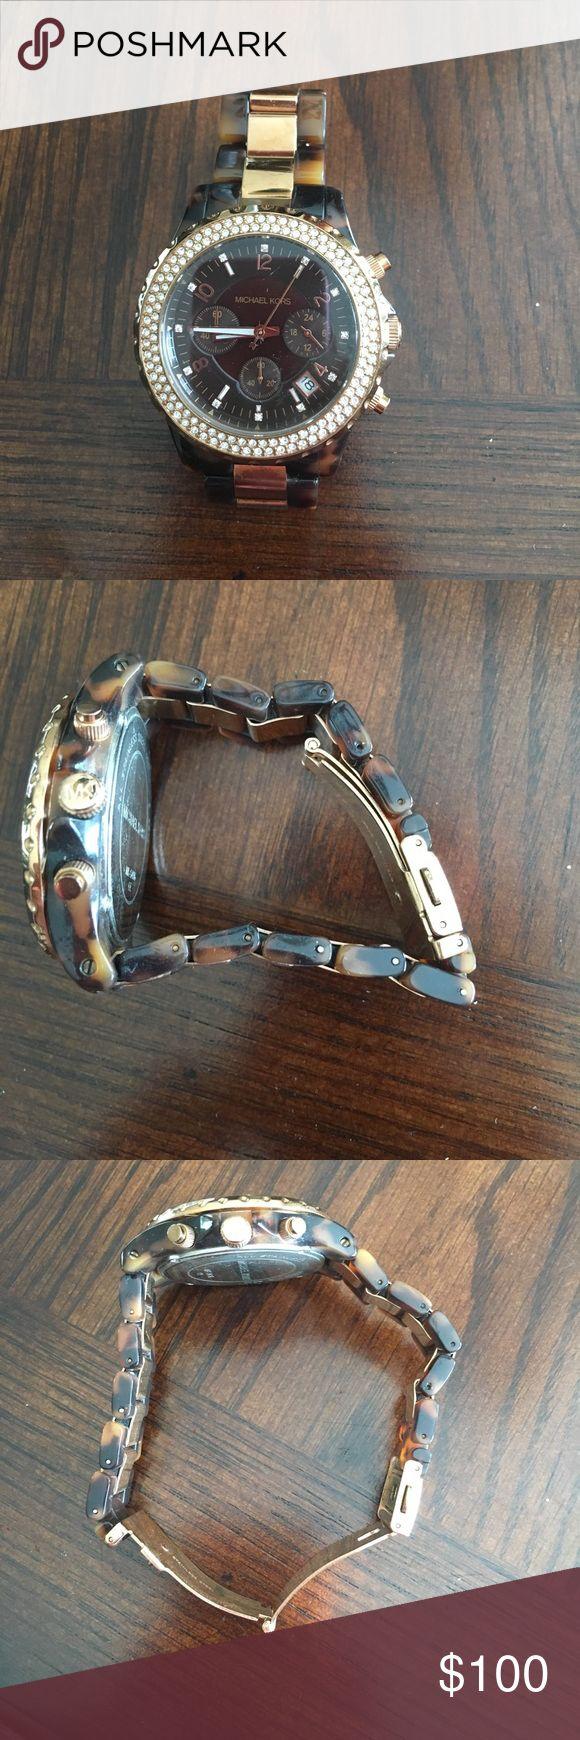 MK tortoise watch Worn once excellent shape! Michael Kors Accessories Watches